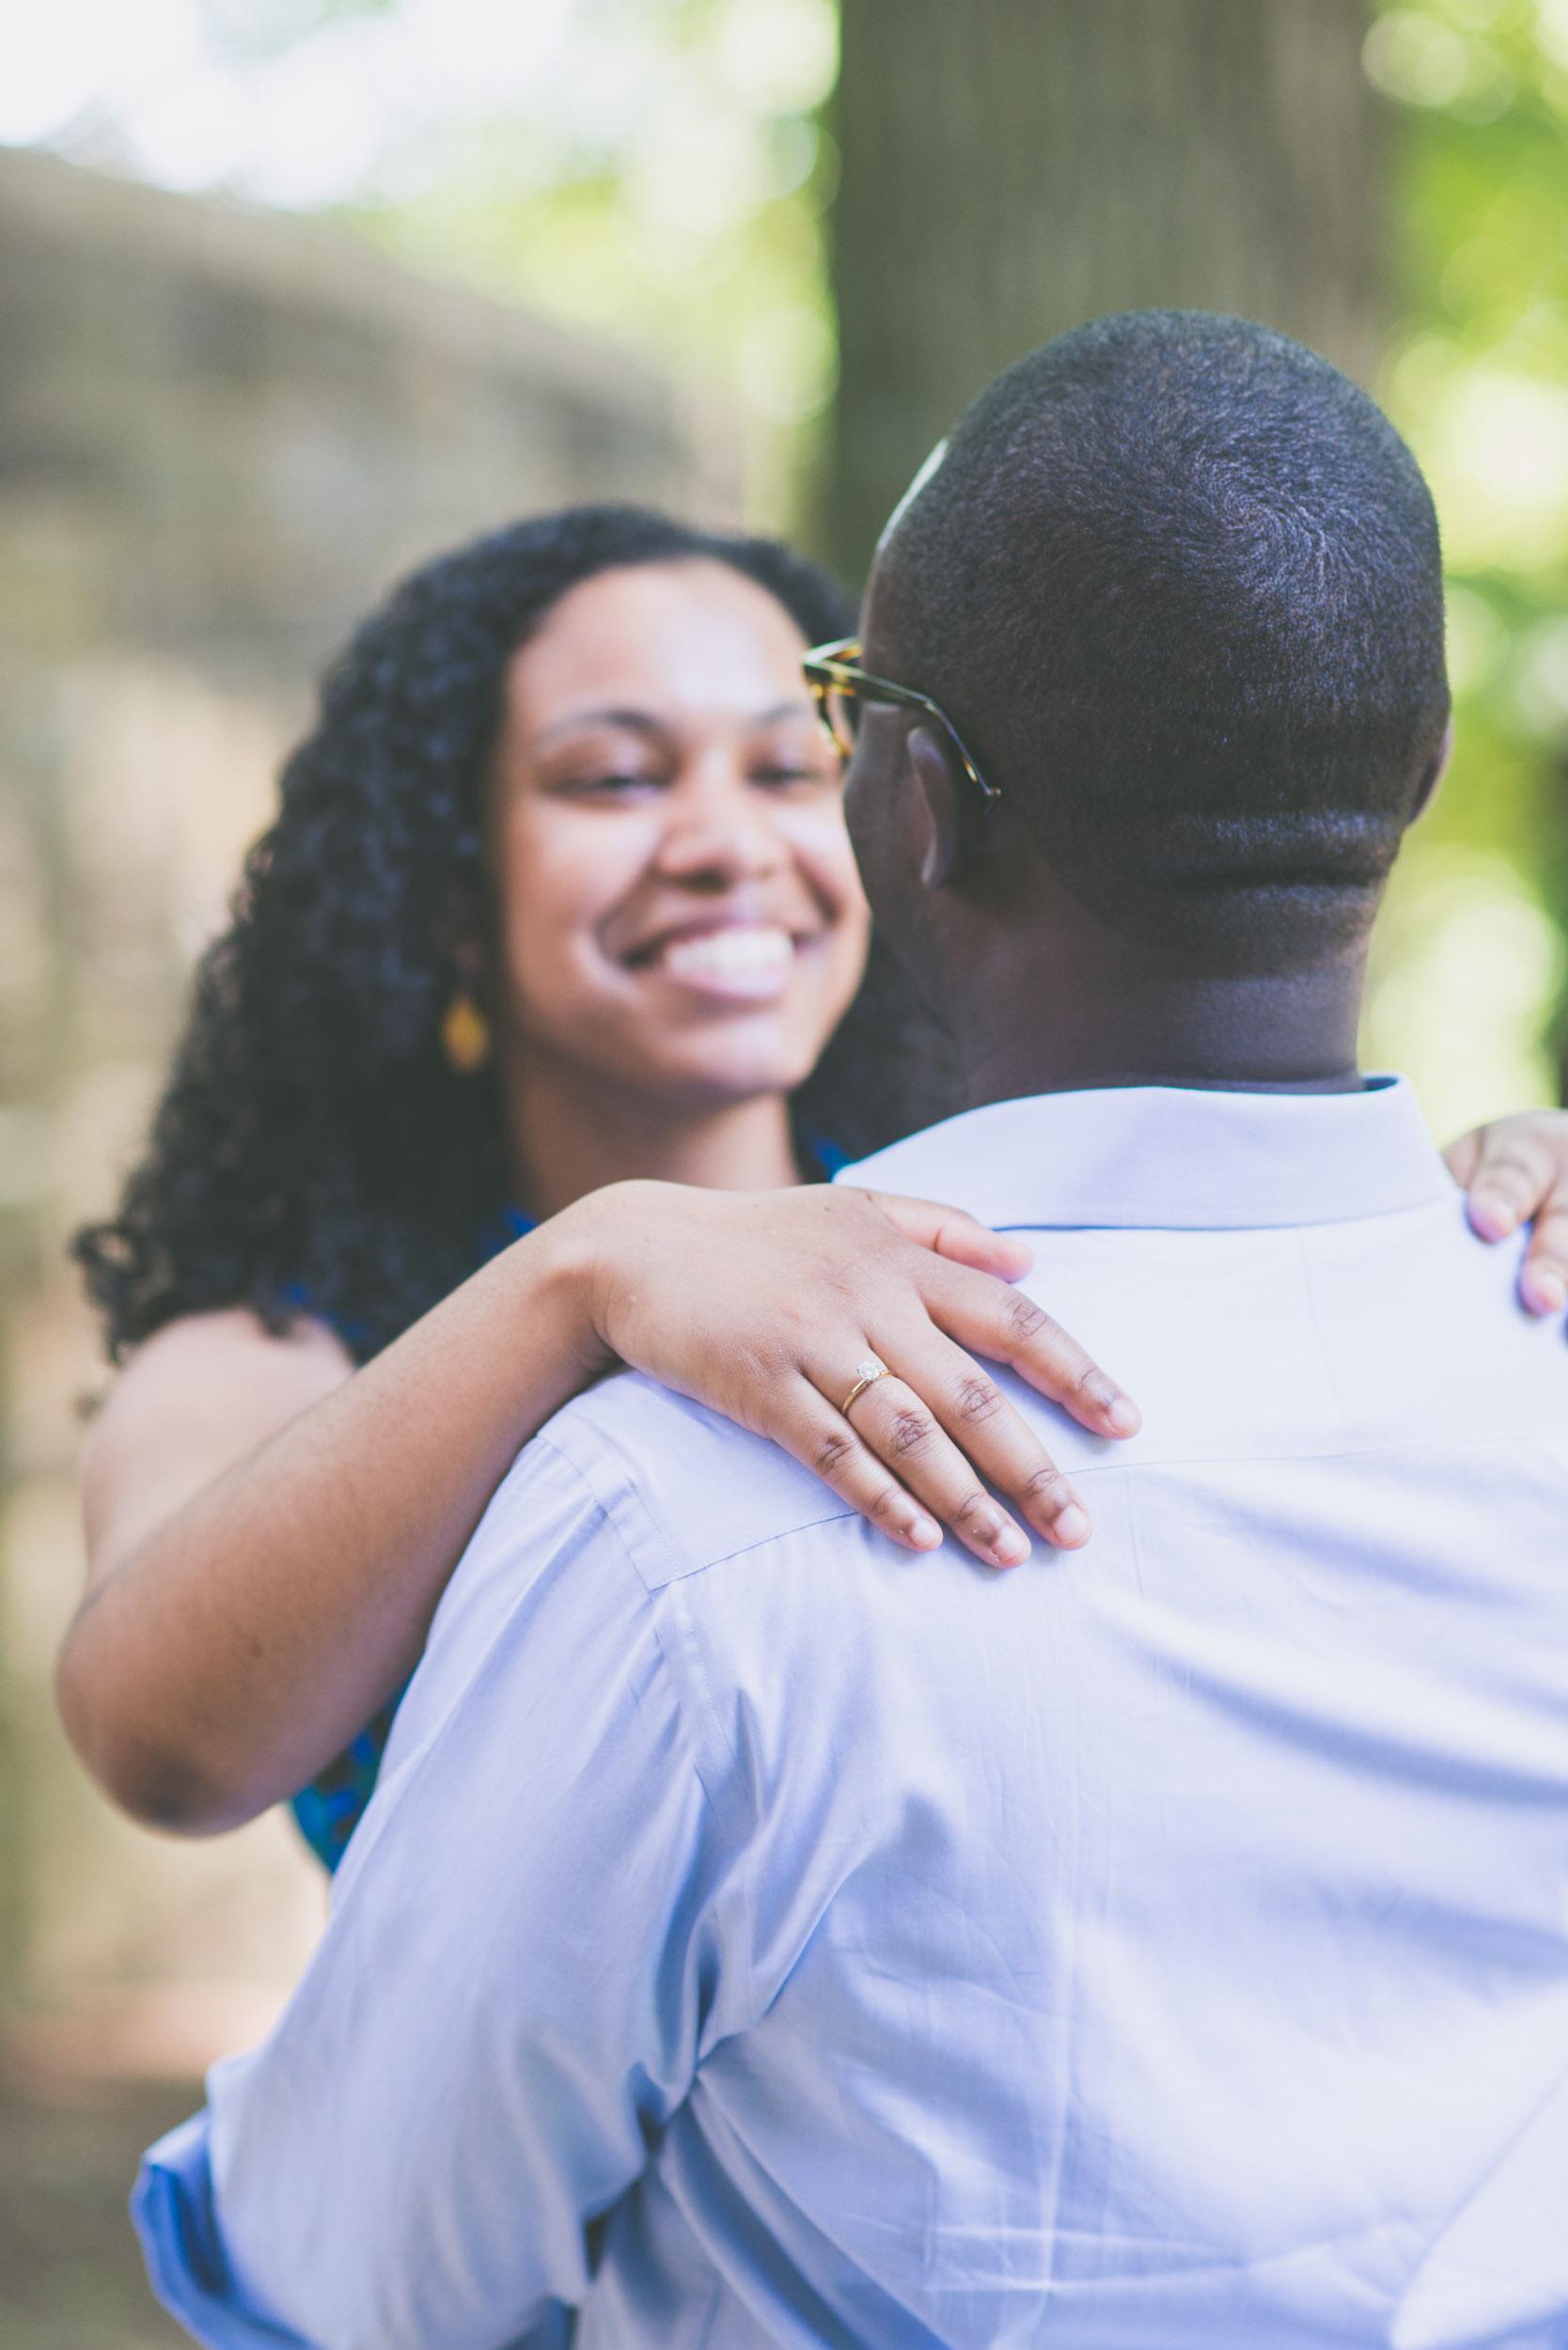 Hand on shoulder - Engagement portraits -  Photo credit Nicola Bailey.jpg